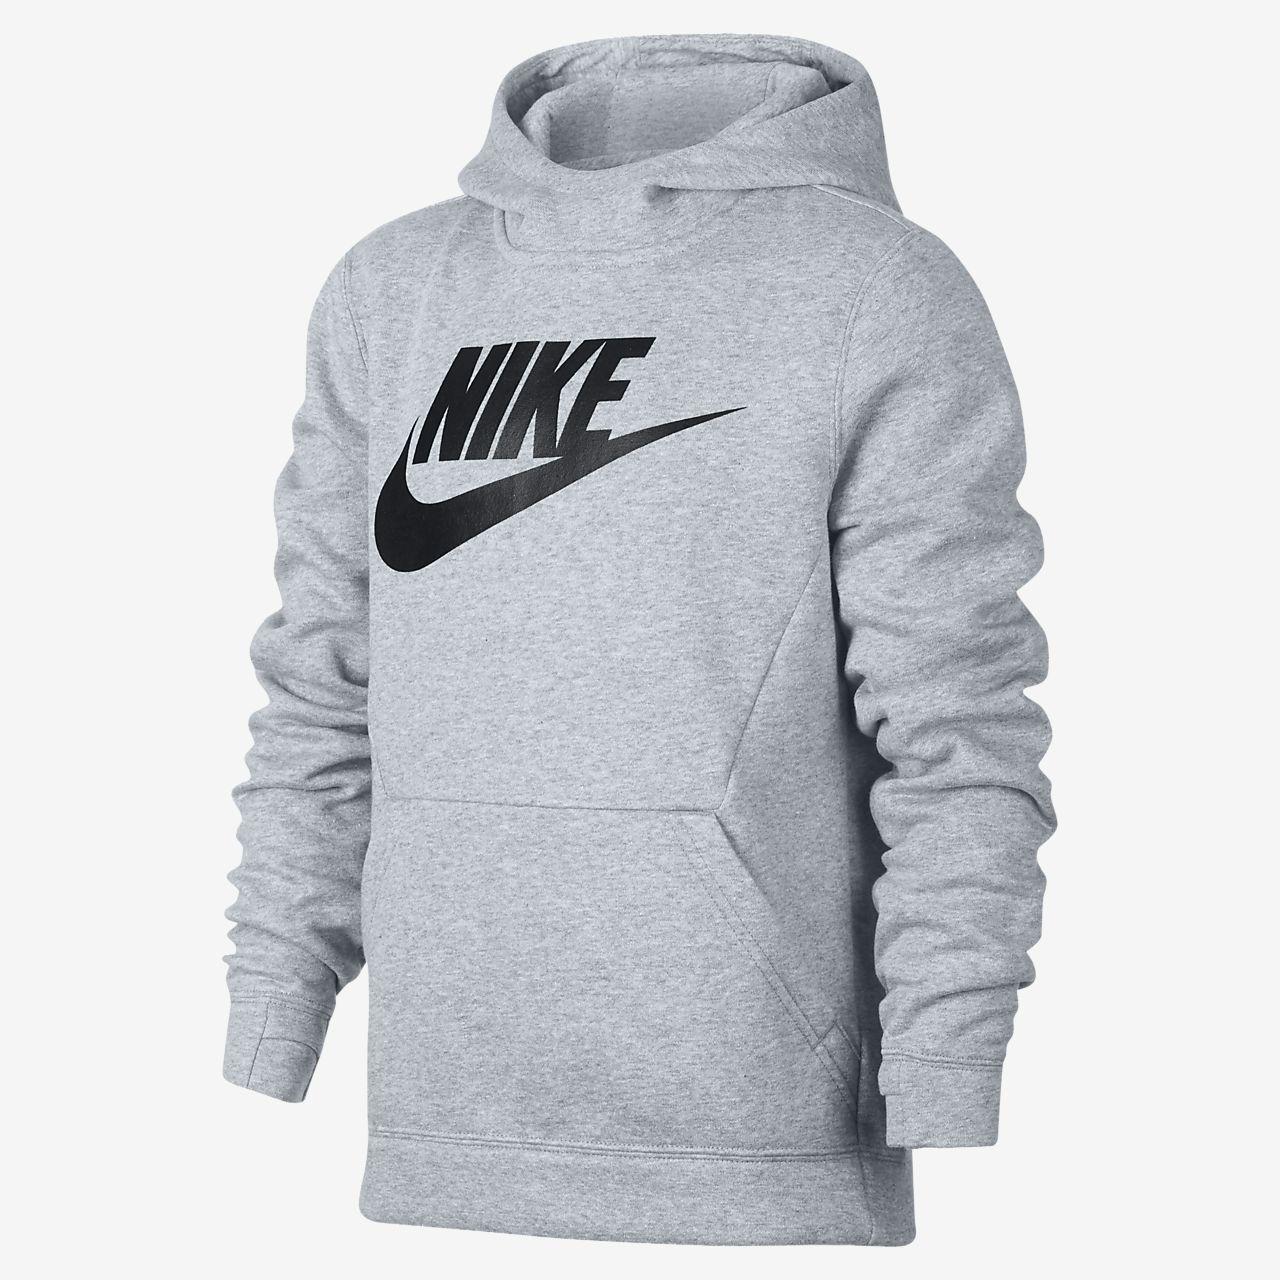 Nike Capucha Con Fleece Sportswear Tejido De Niño Sudadera 45ALcq3Rj